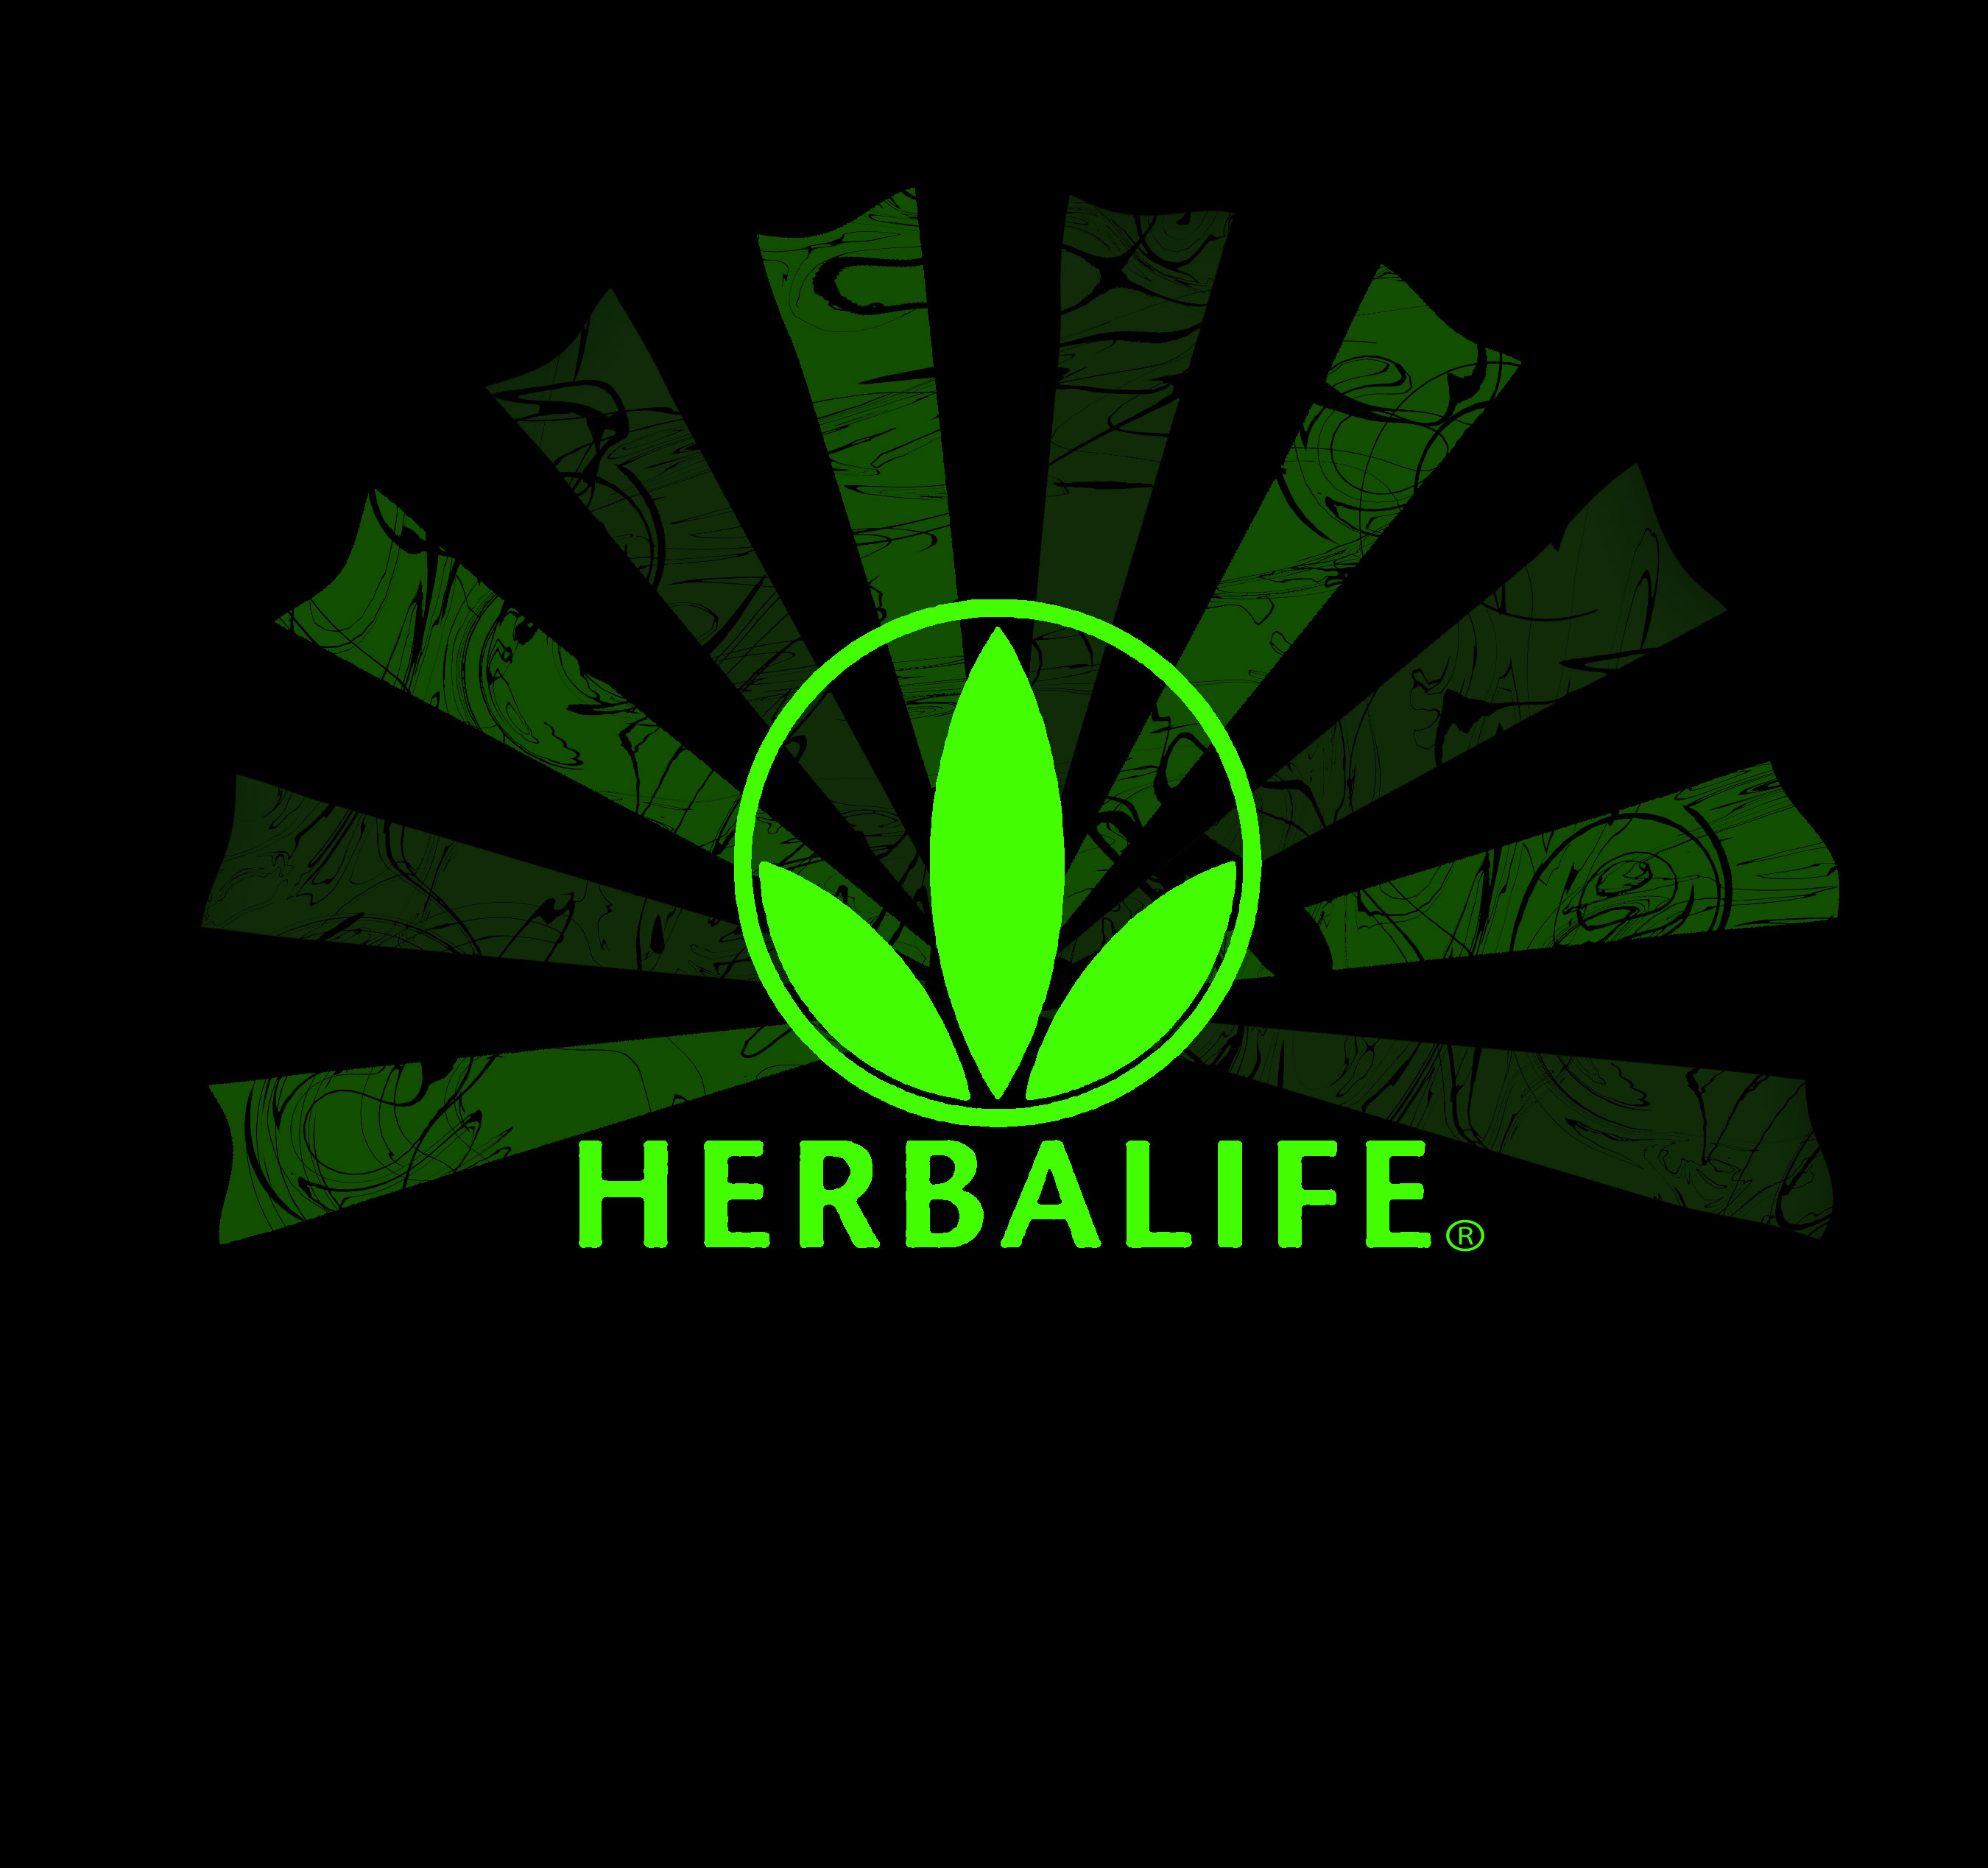 Herbalife Logos